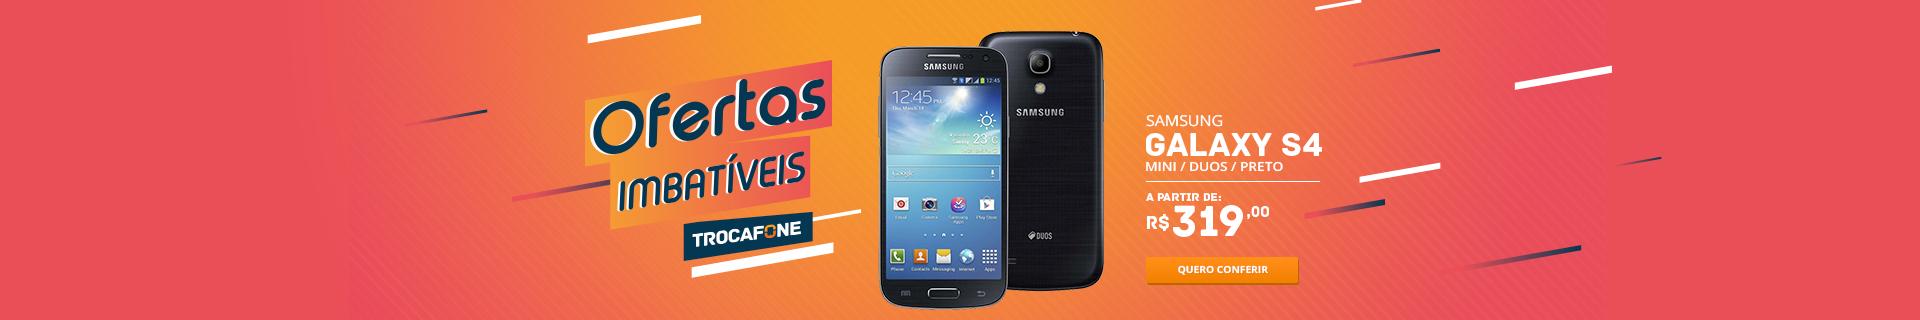 Trocafone | Samsung Galaxy S4 Mini Duos